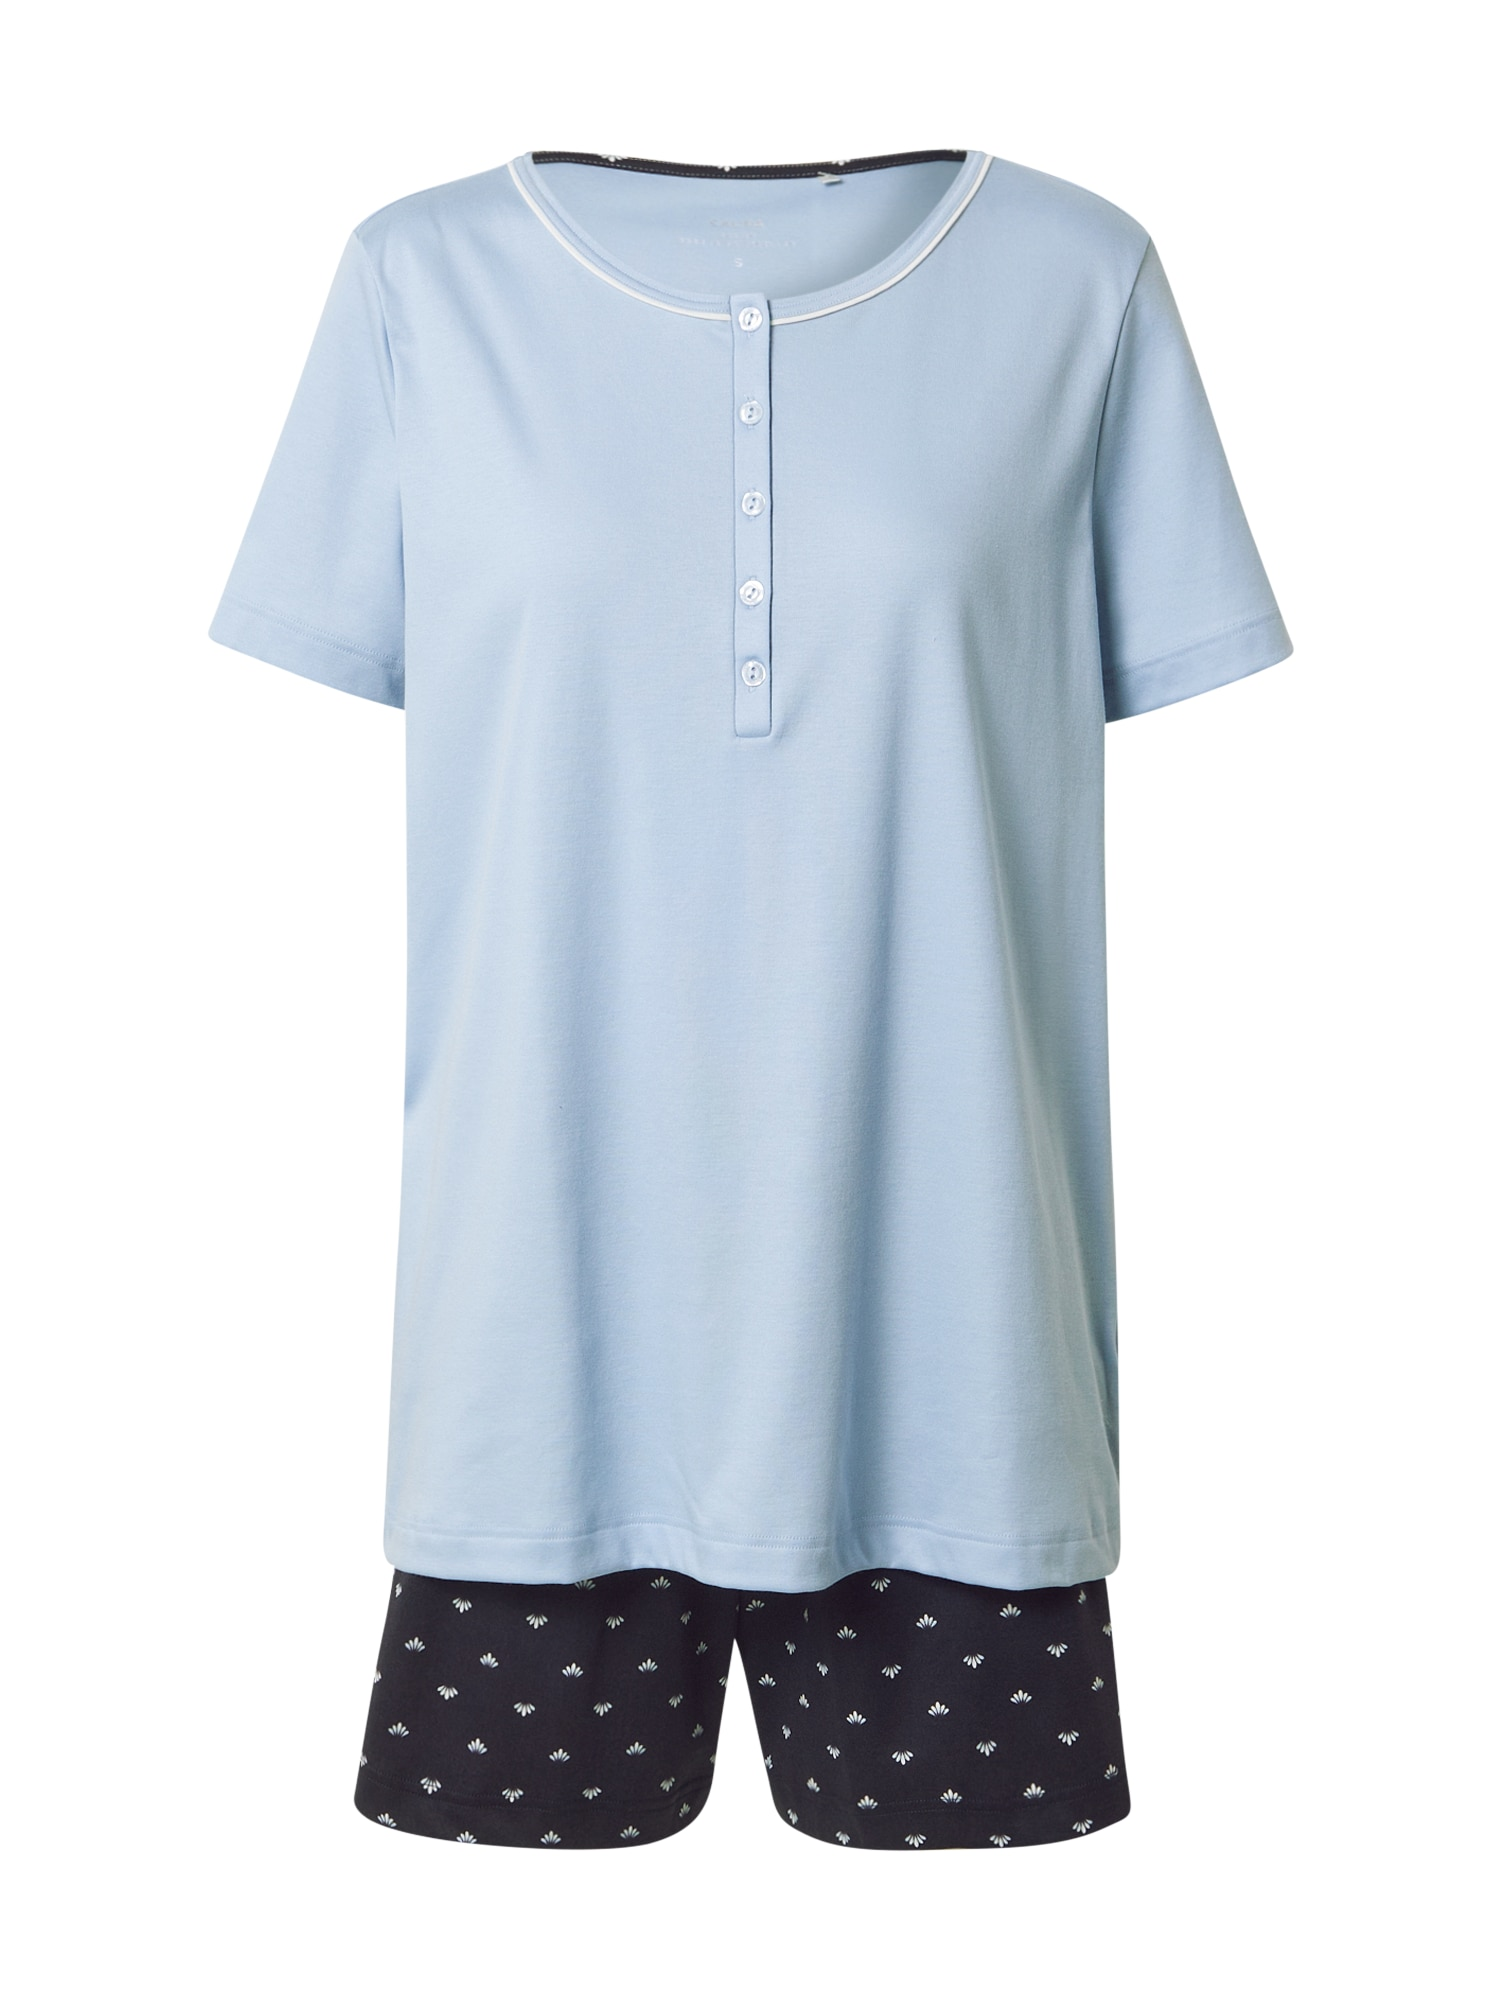 CALIDA Pižama šviesiai mėlyna / tamsiai mėlyna